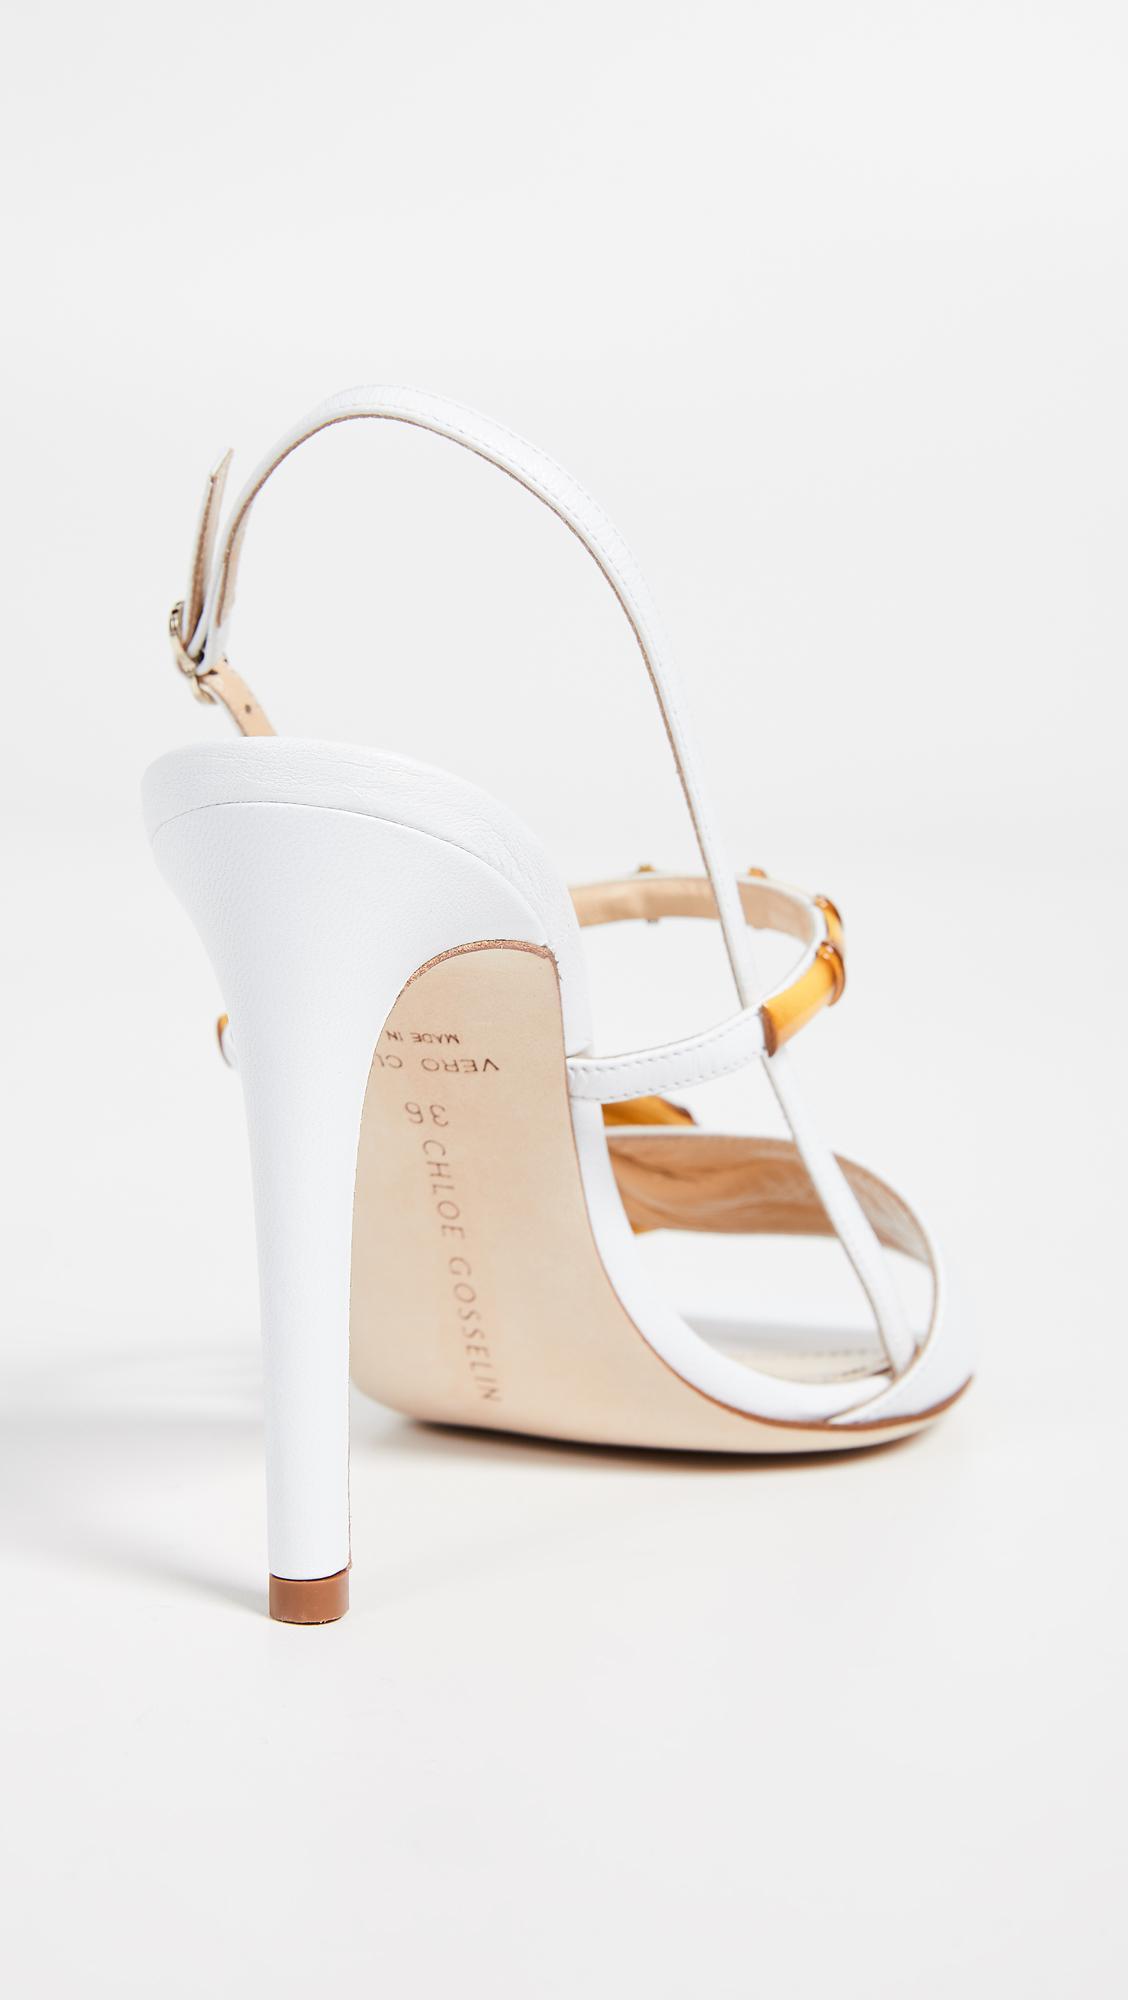 fde118bdf0d504 Chloe Gosselin - White Celeste Sandals - Lyst. View fullscreen